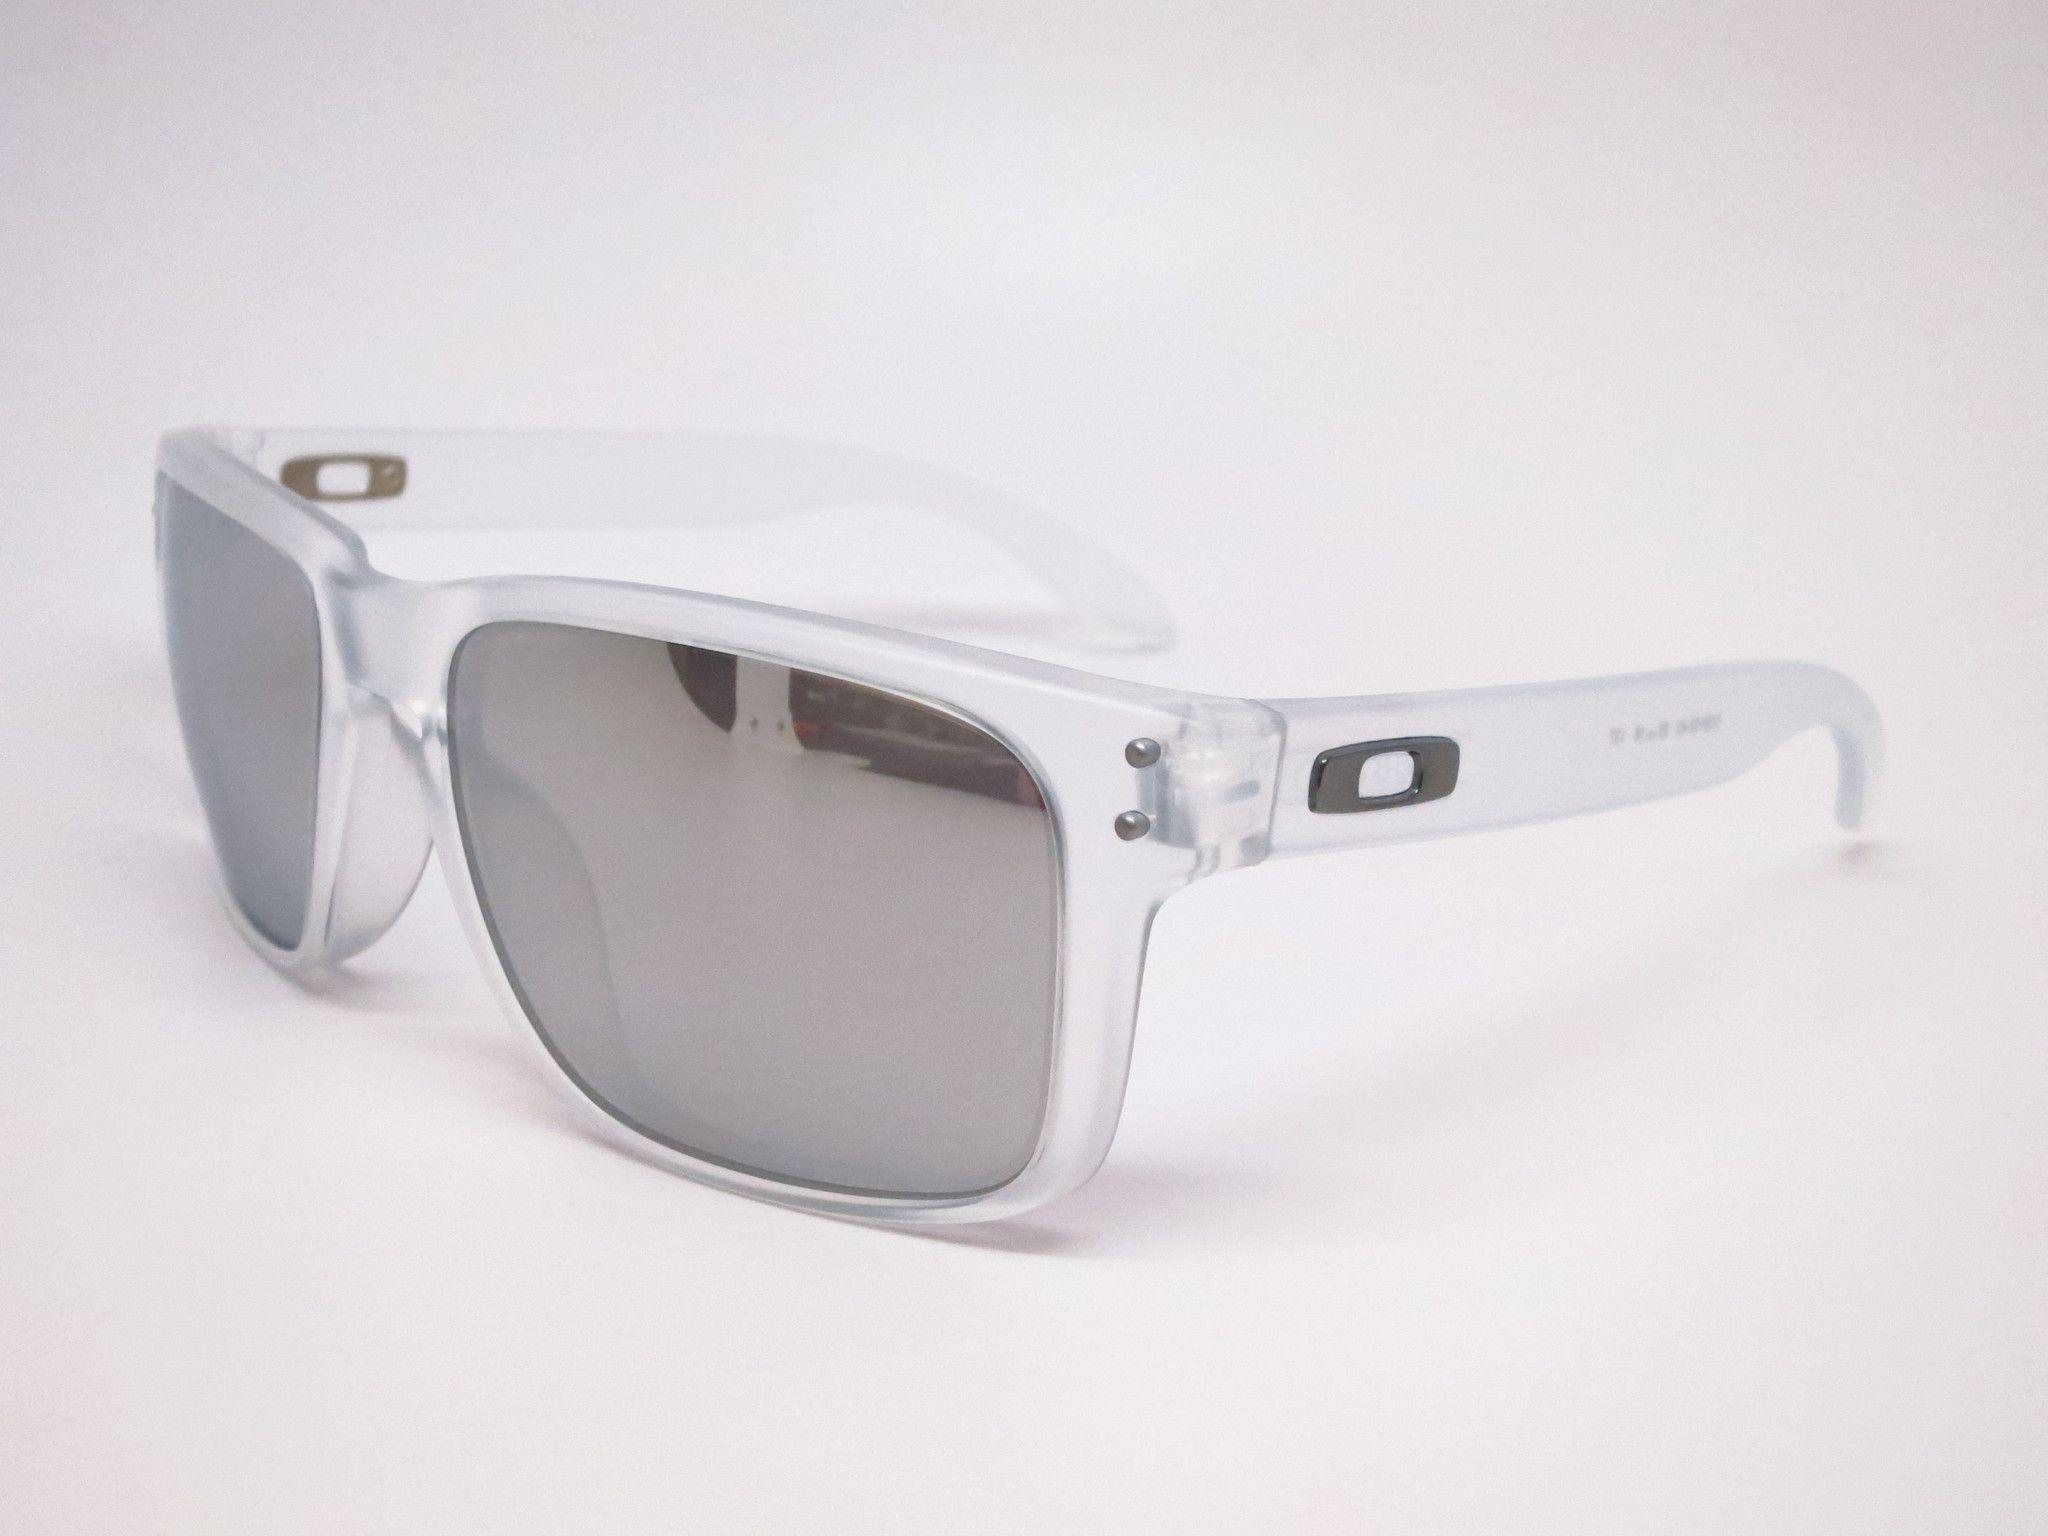 d64e8f394d Oakley Holbrook OO9102-A2 Matte Clear Sunglasses